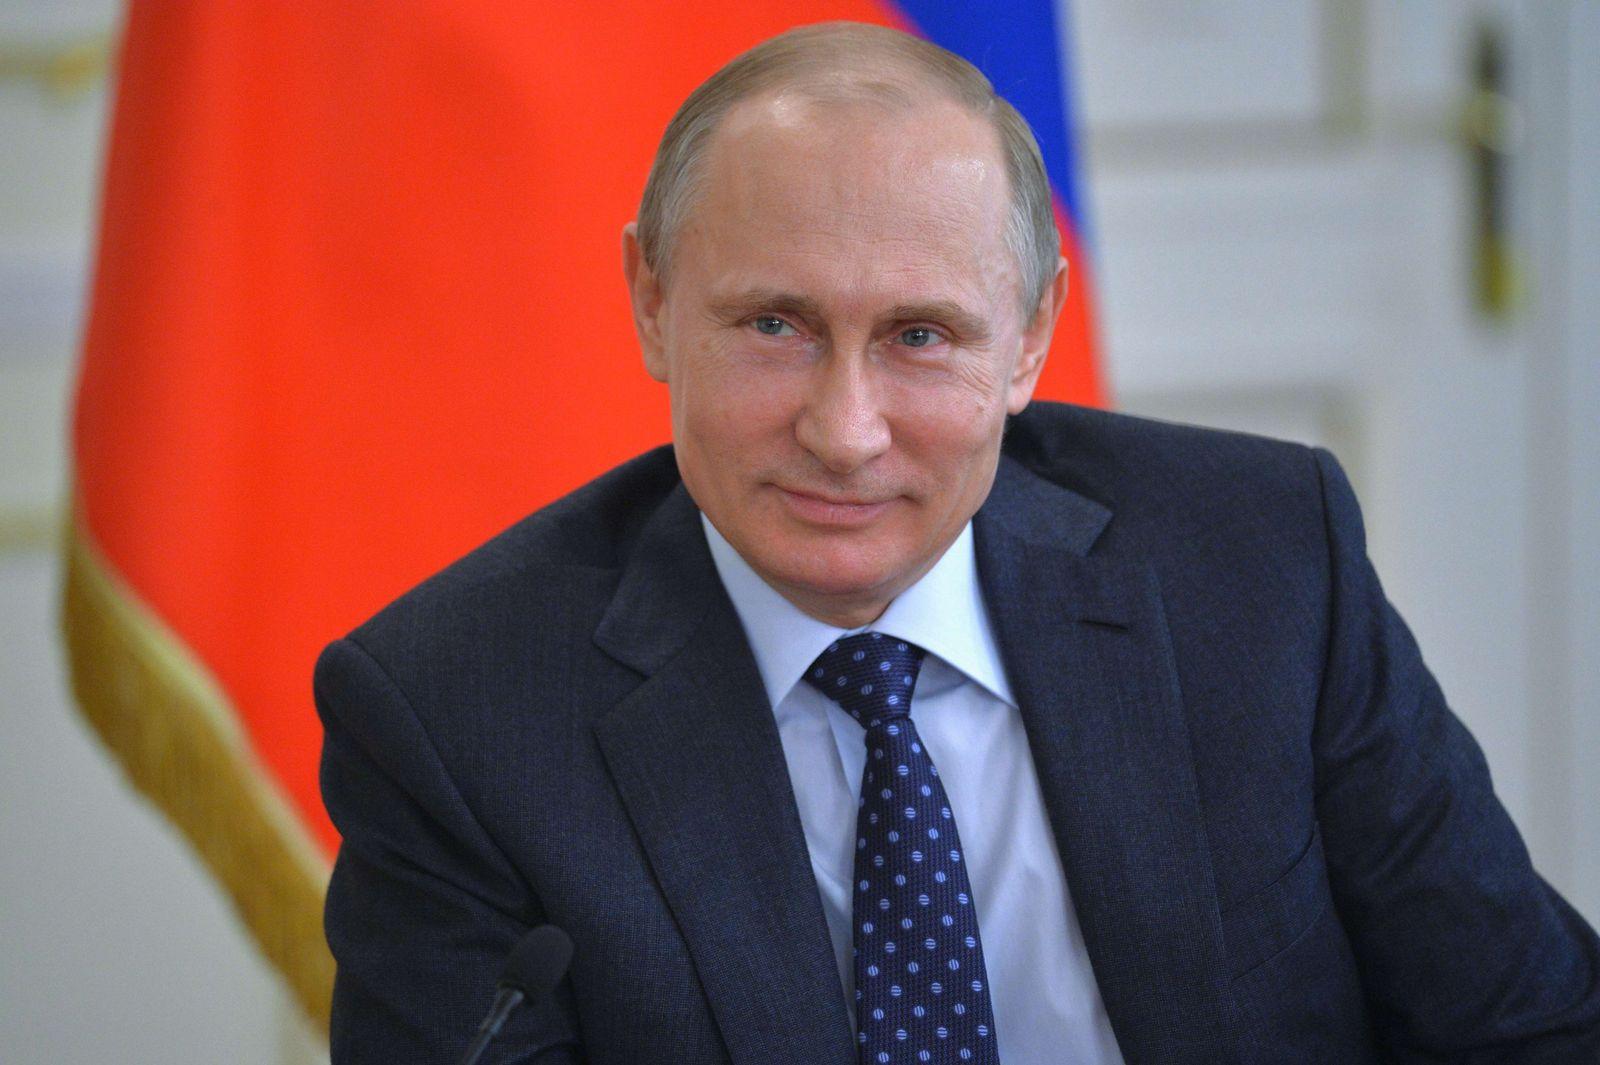 RUSSIA-PUTIN-INTERNET